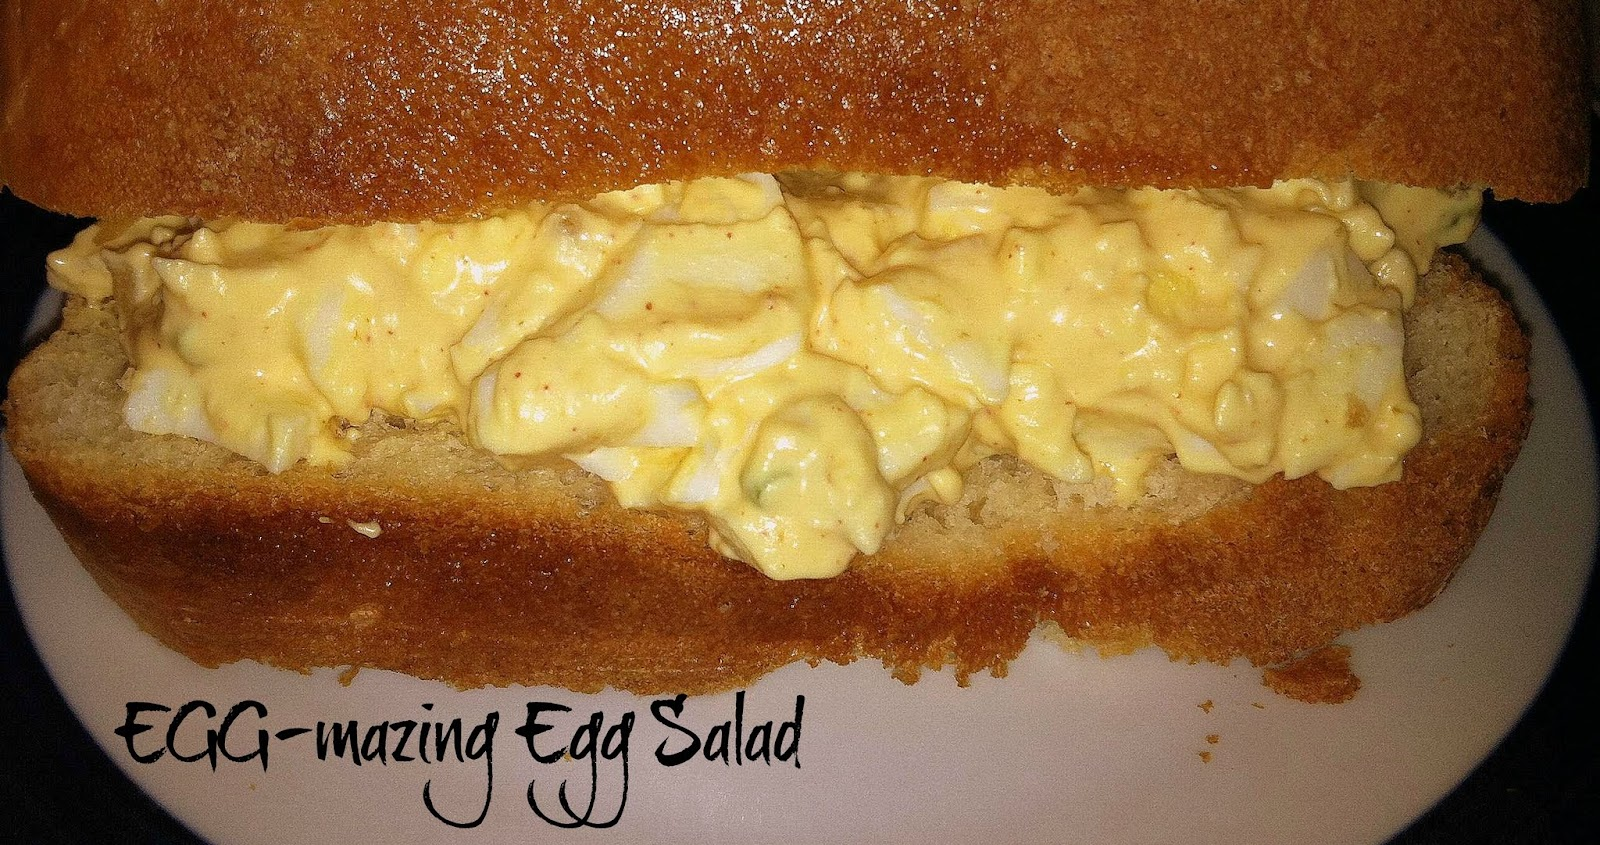 Egg-mazing Egg Salad | Sugar for Breakfast: Egg-mazing Egg Salad